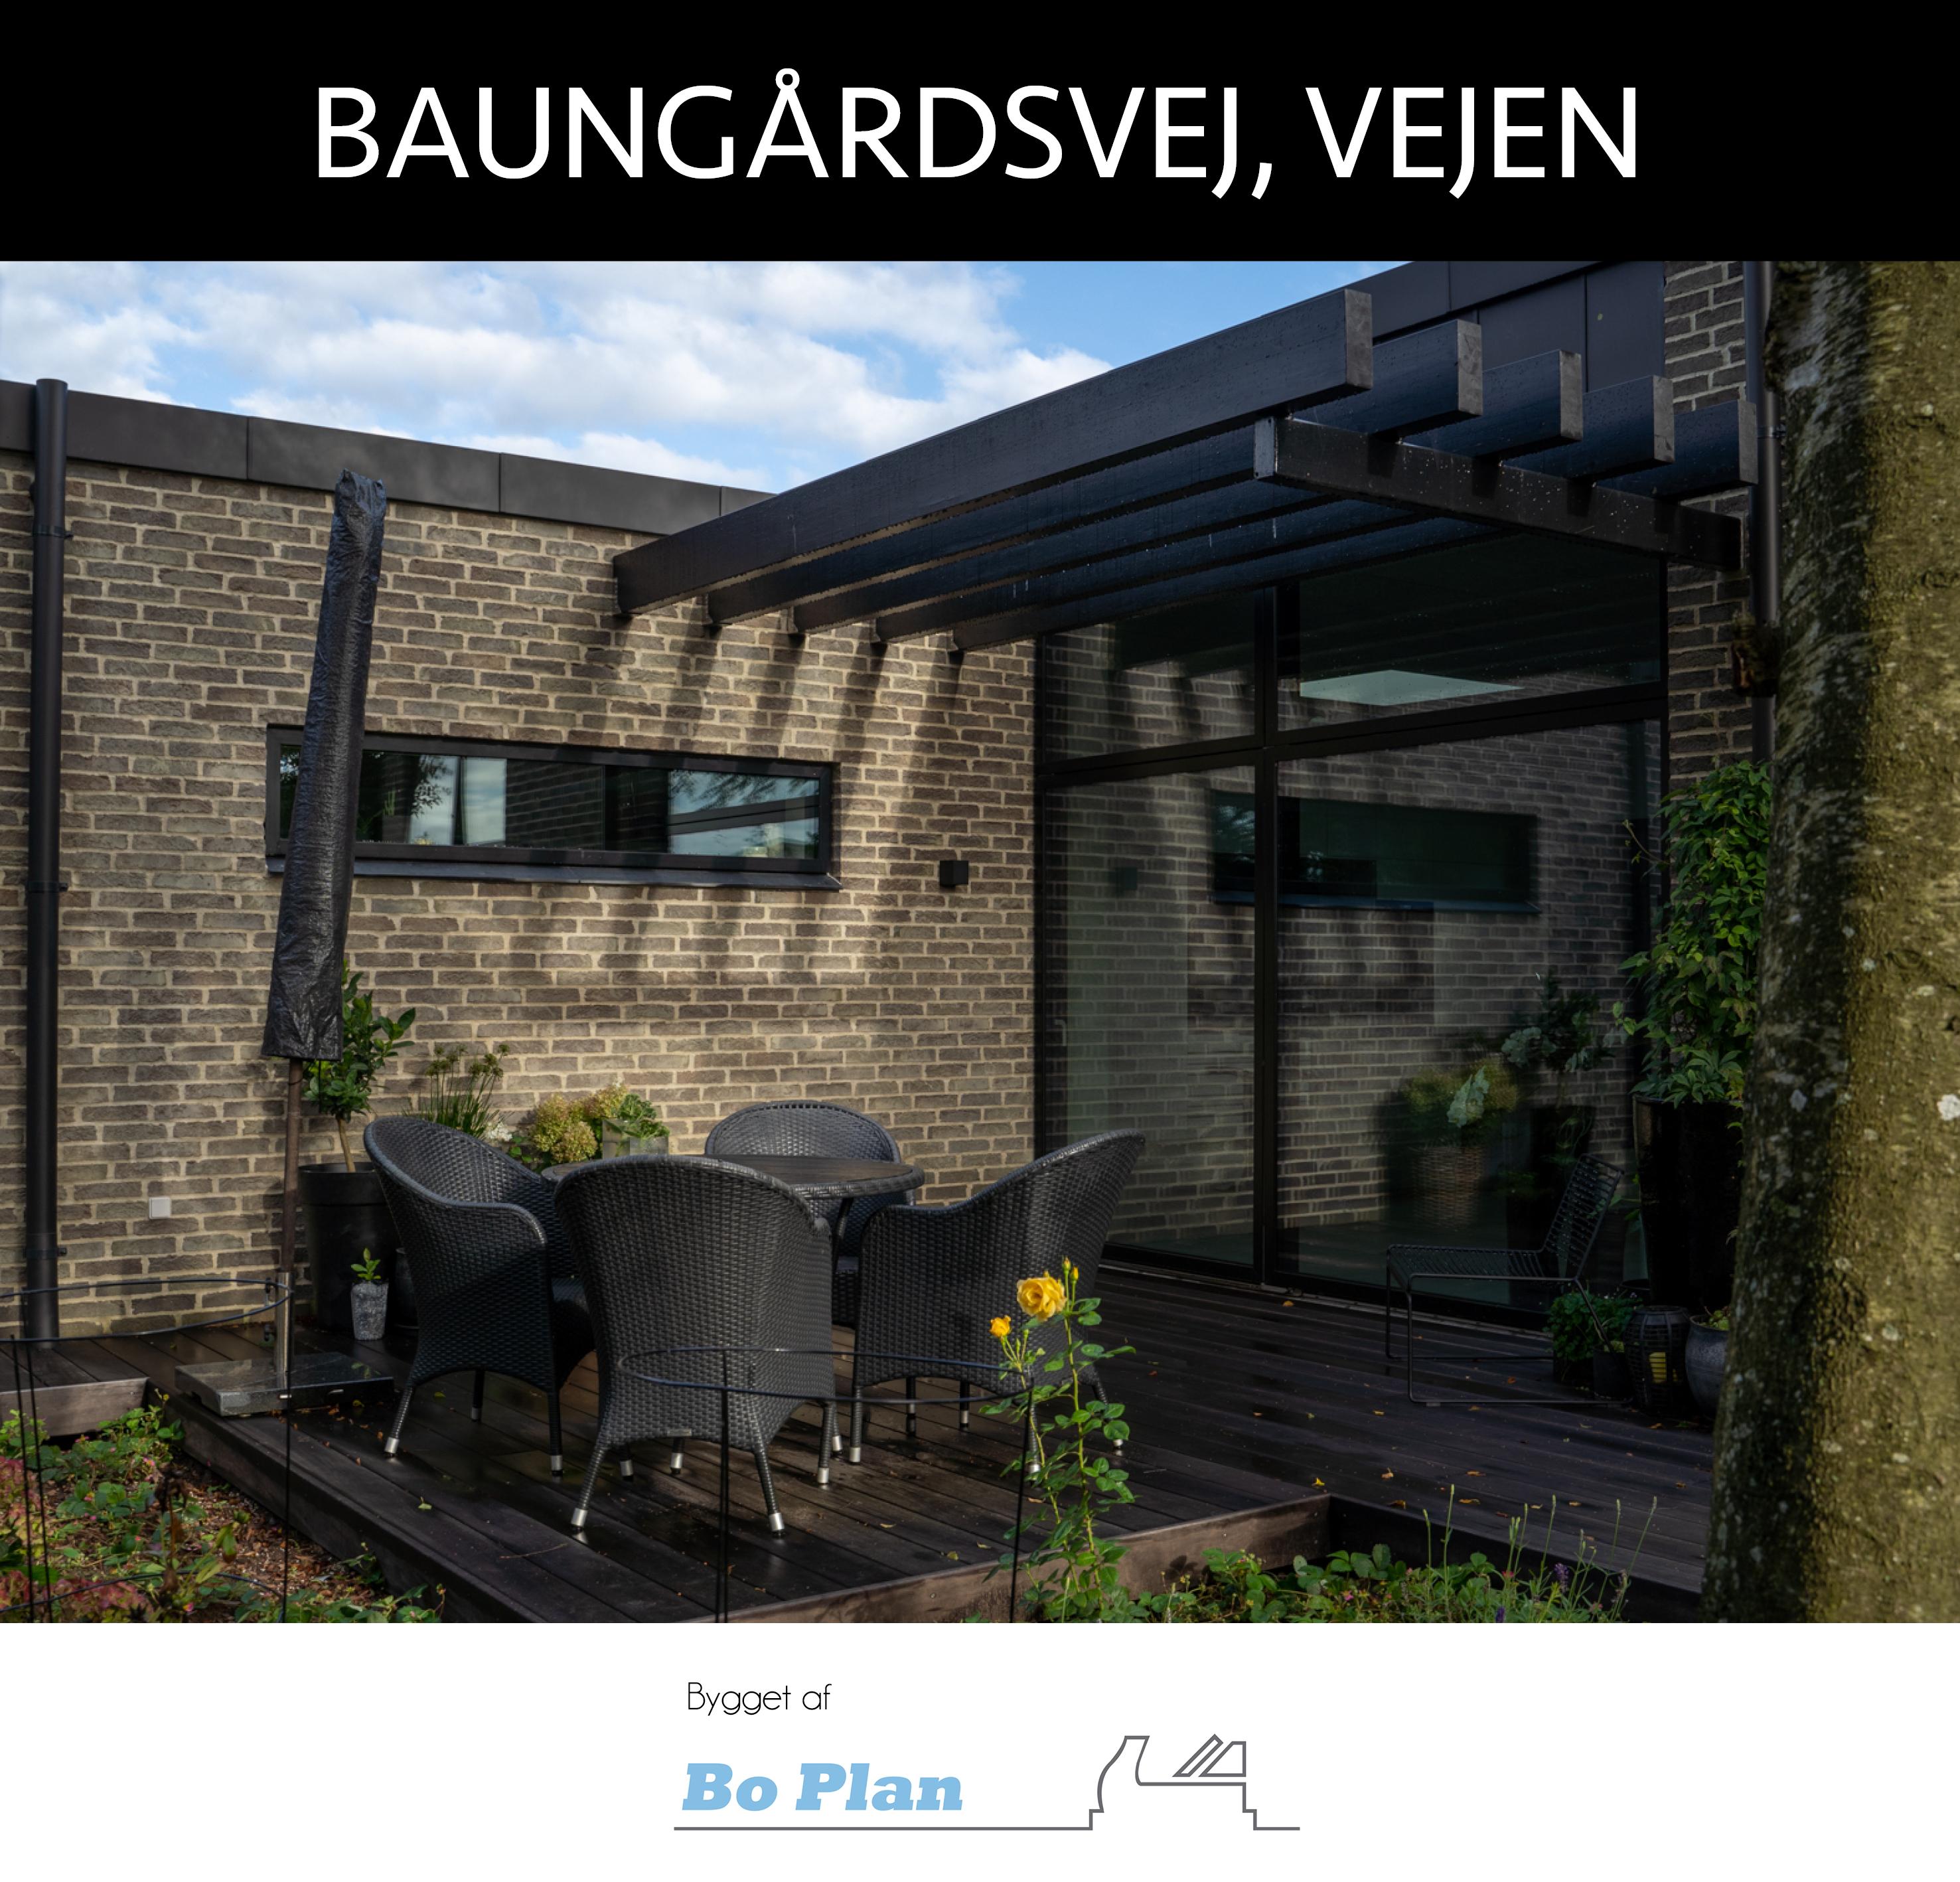 Baungårdsvej, forår20198